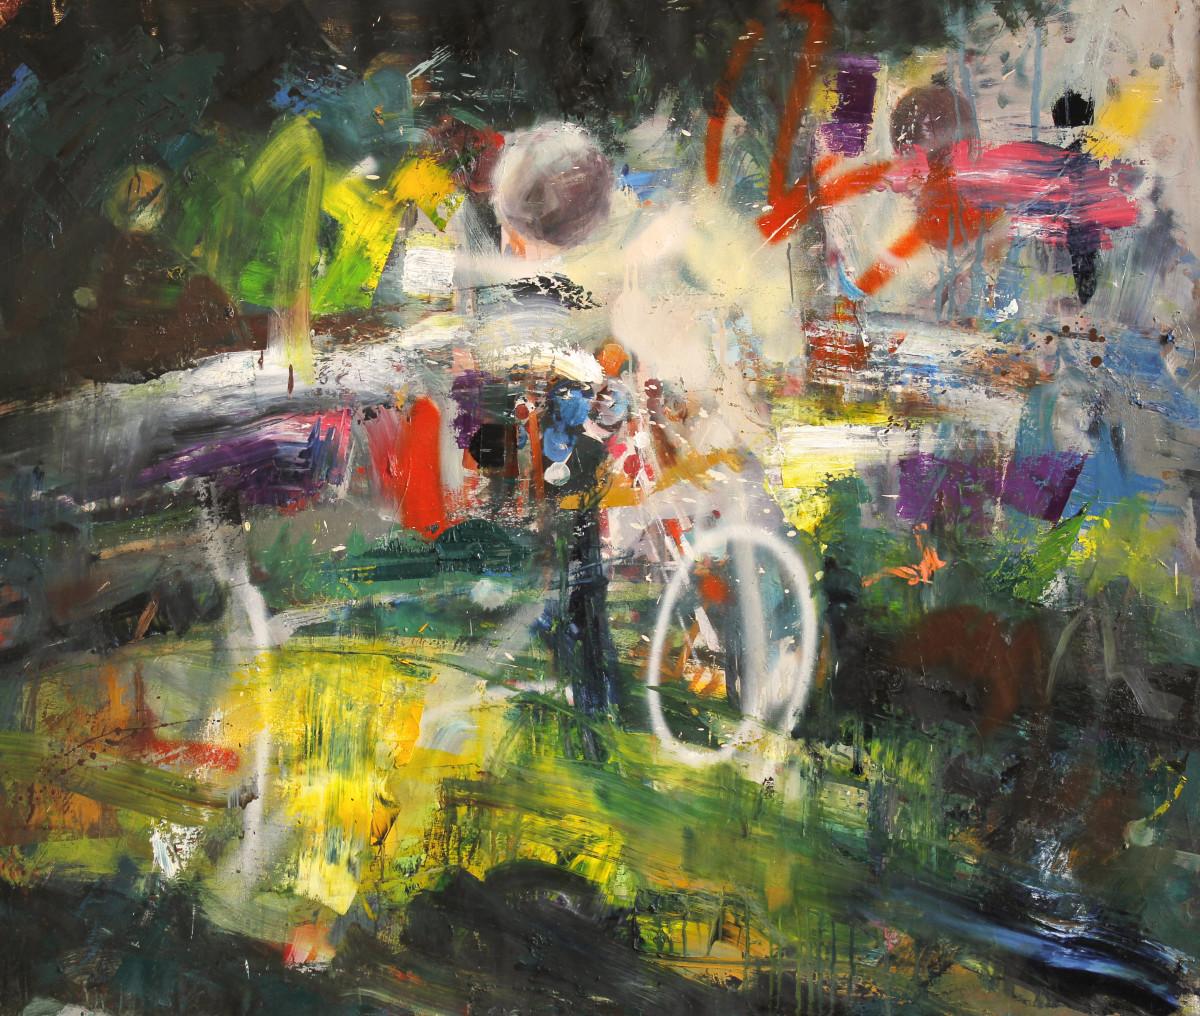 She Dreams Green by Simon Boyd